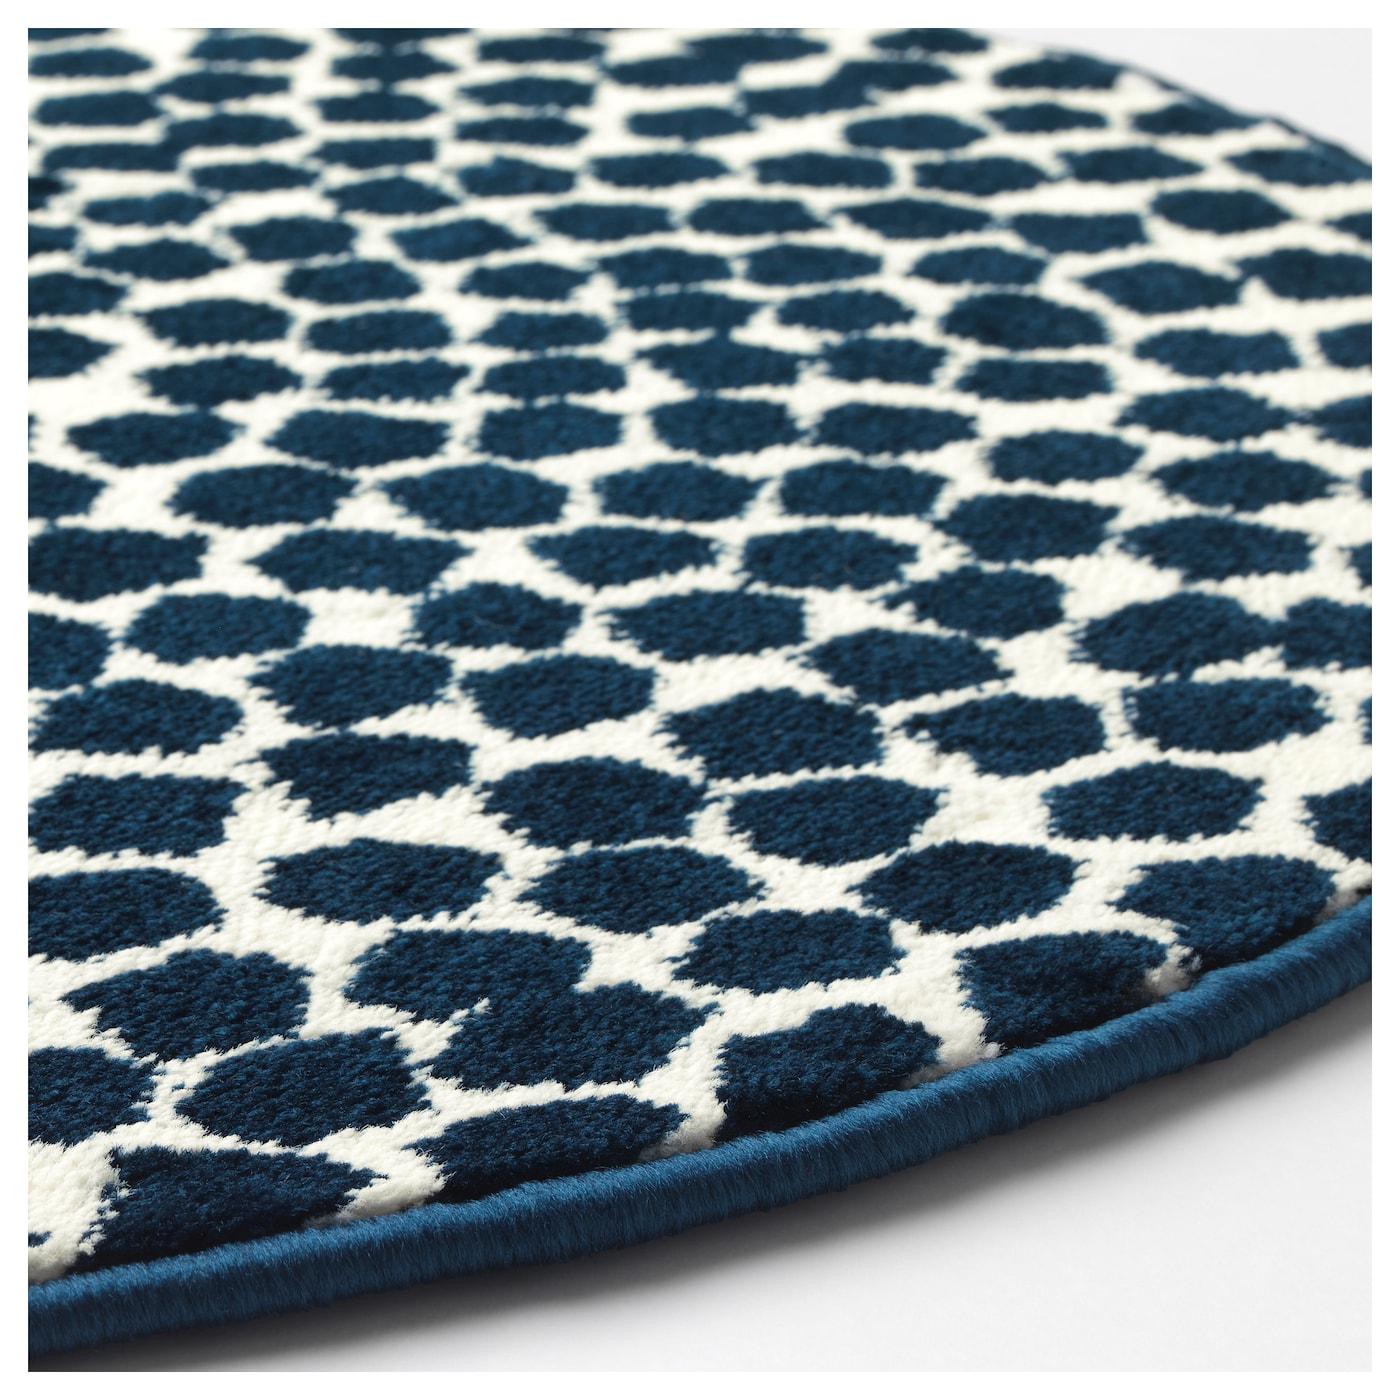 Fl ng tapis poils ras blanc bleu fonc 80 cm ikea - Tapis bleu marine ikea ...